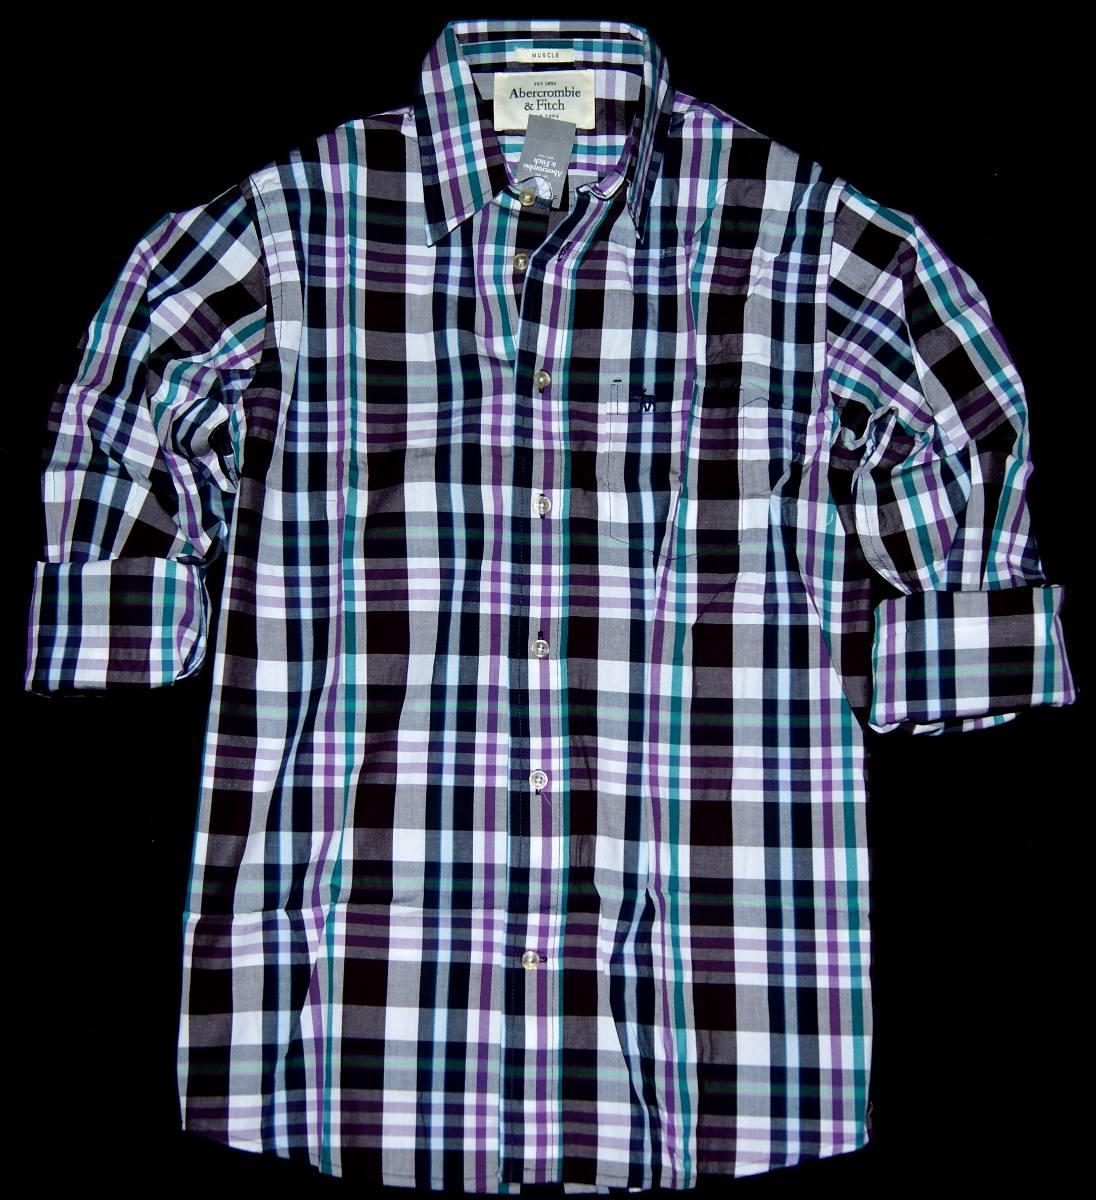 Camisetas Abercrombie Al Por Mayor Cali